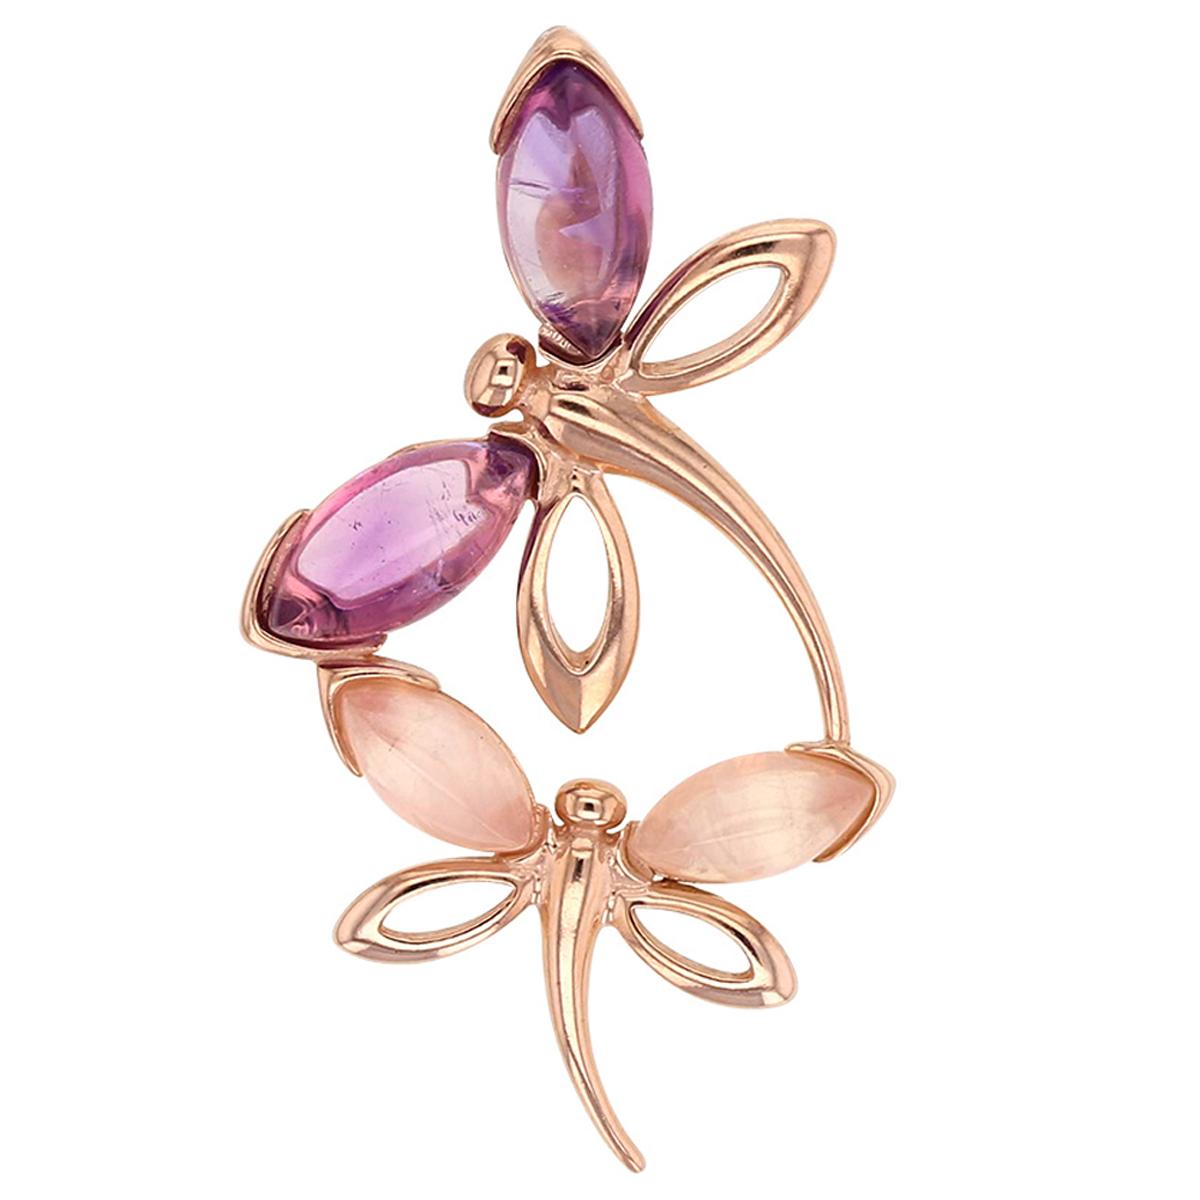 Pendentif Argent artisanal \'Meghan\' rose violet rosé (Libellule) - 40x20 mm - [R5449]